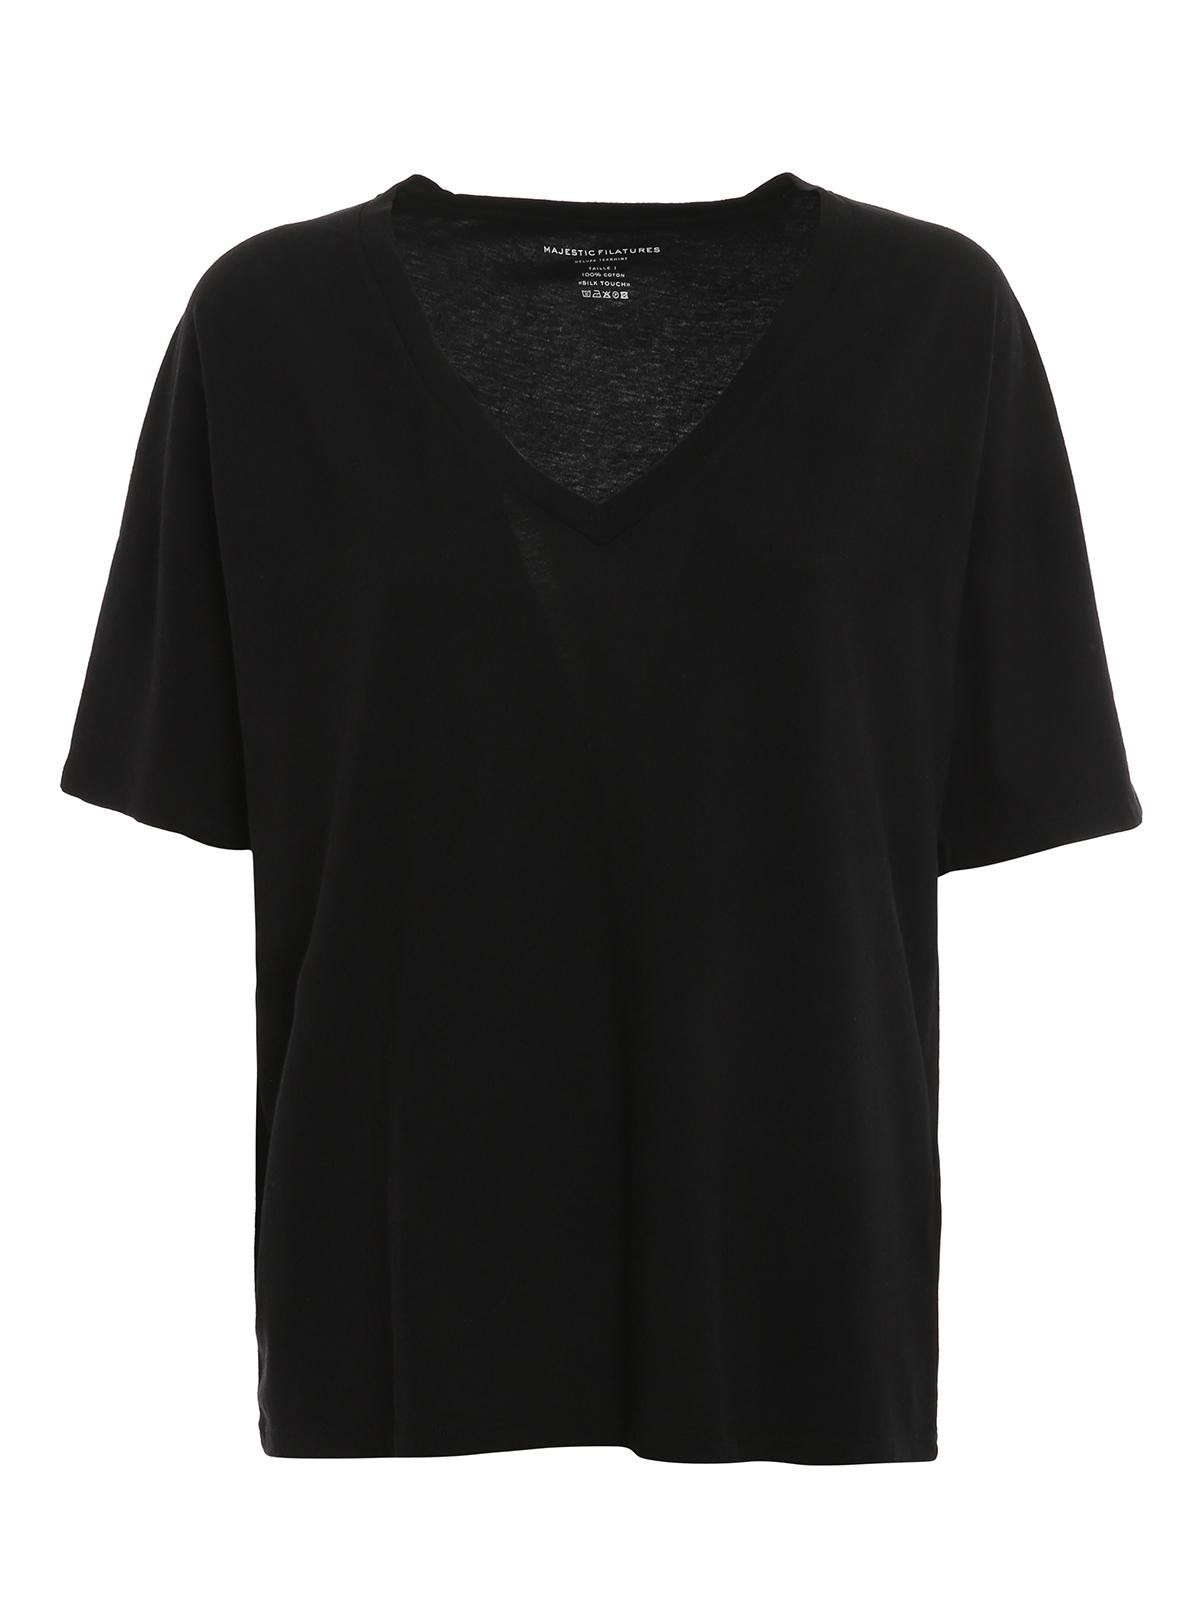 Majestic T-shirts COTTON V NECK T-SHIRT